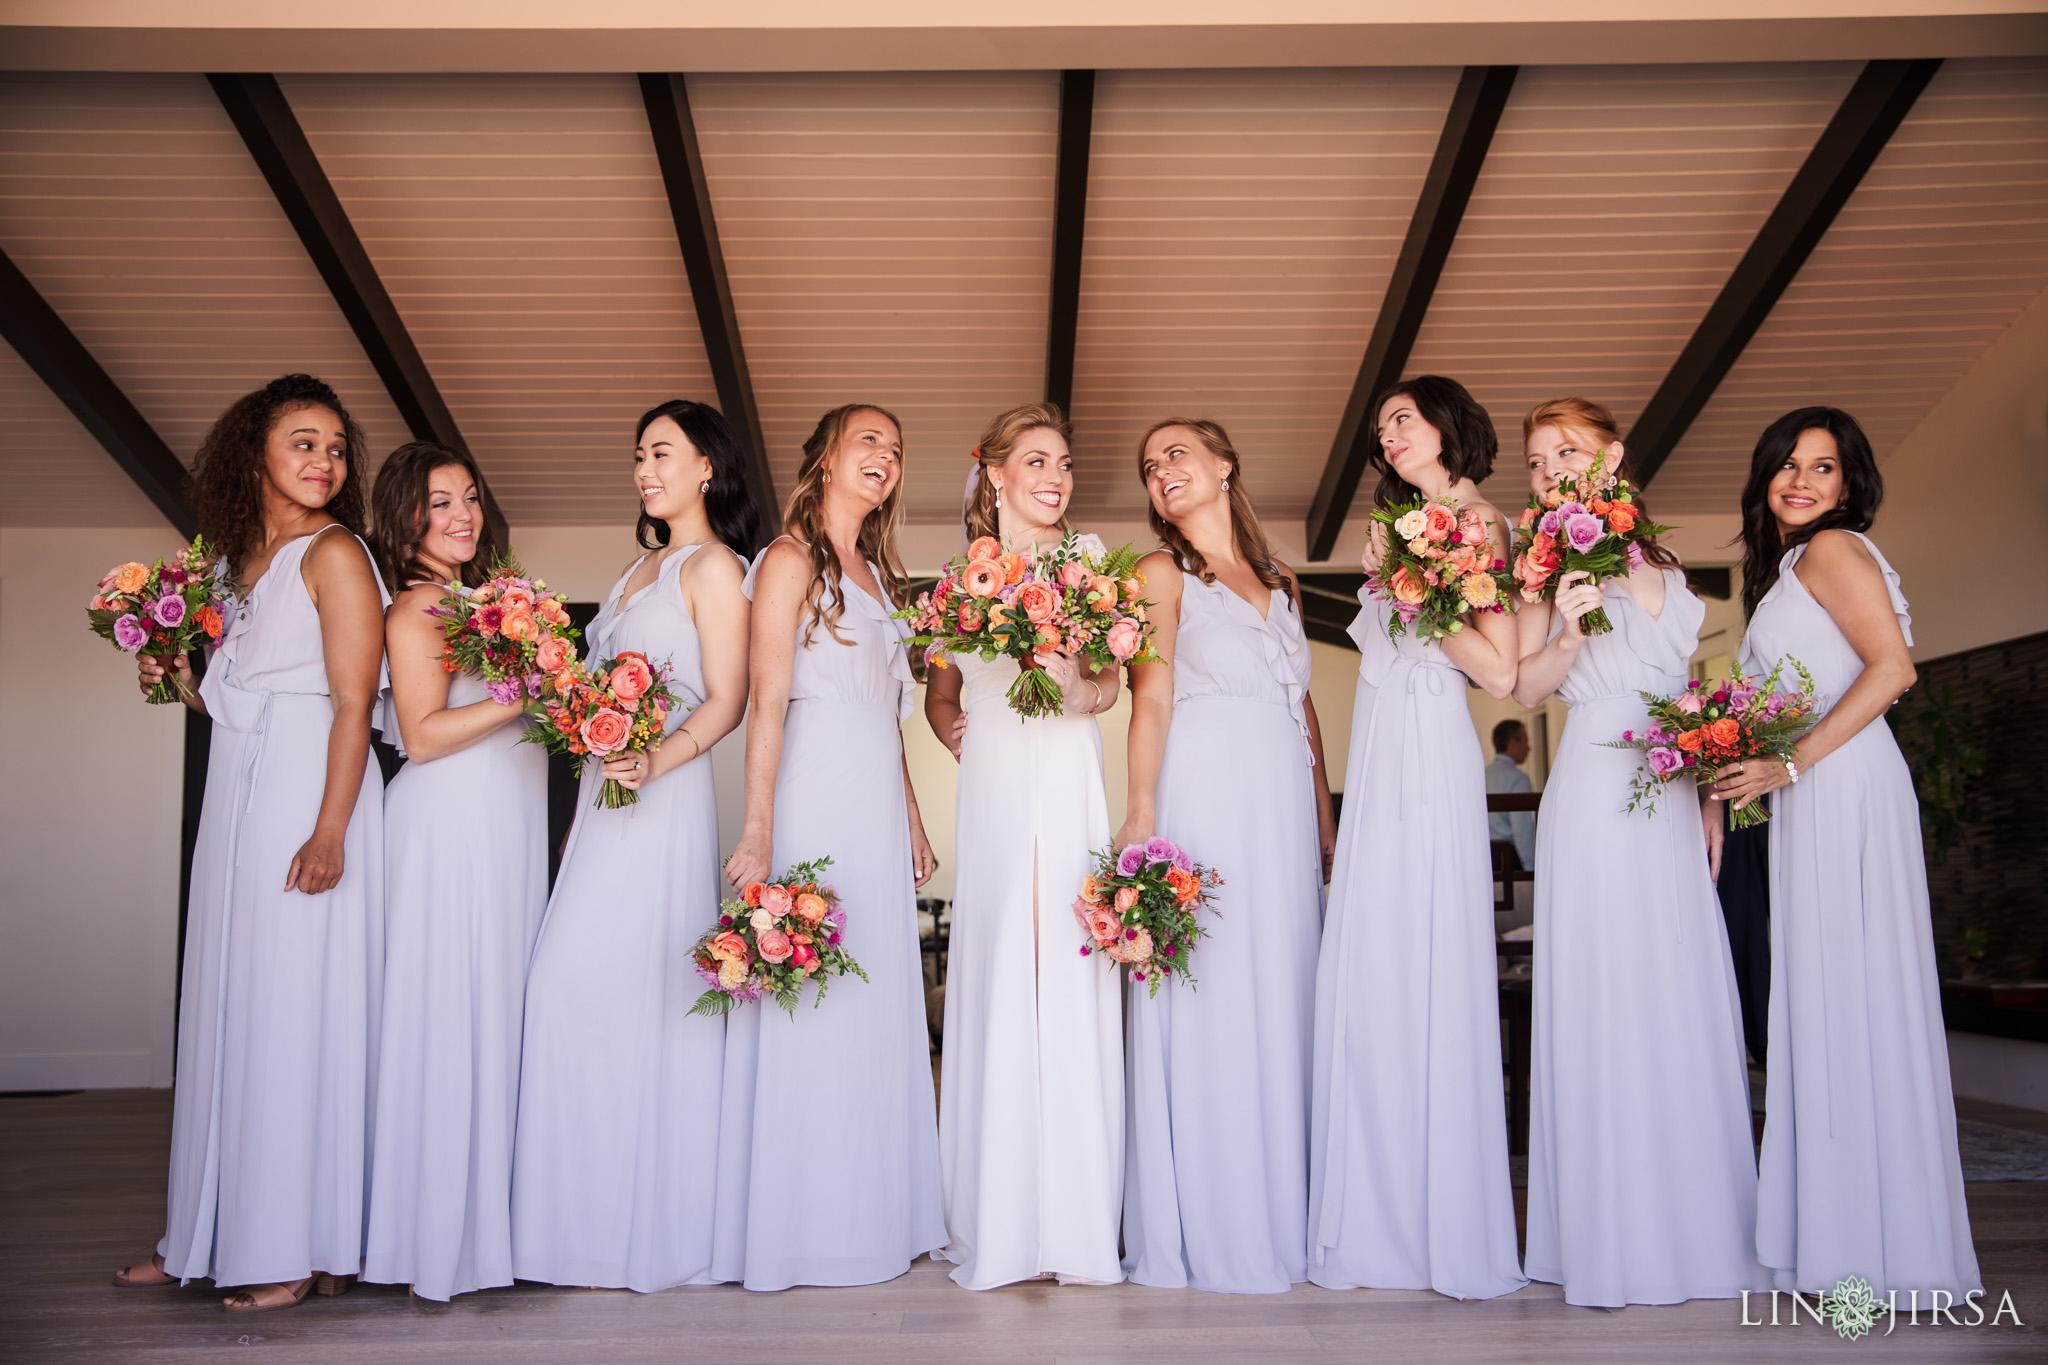 07 palos verdes wedding photography